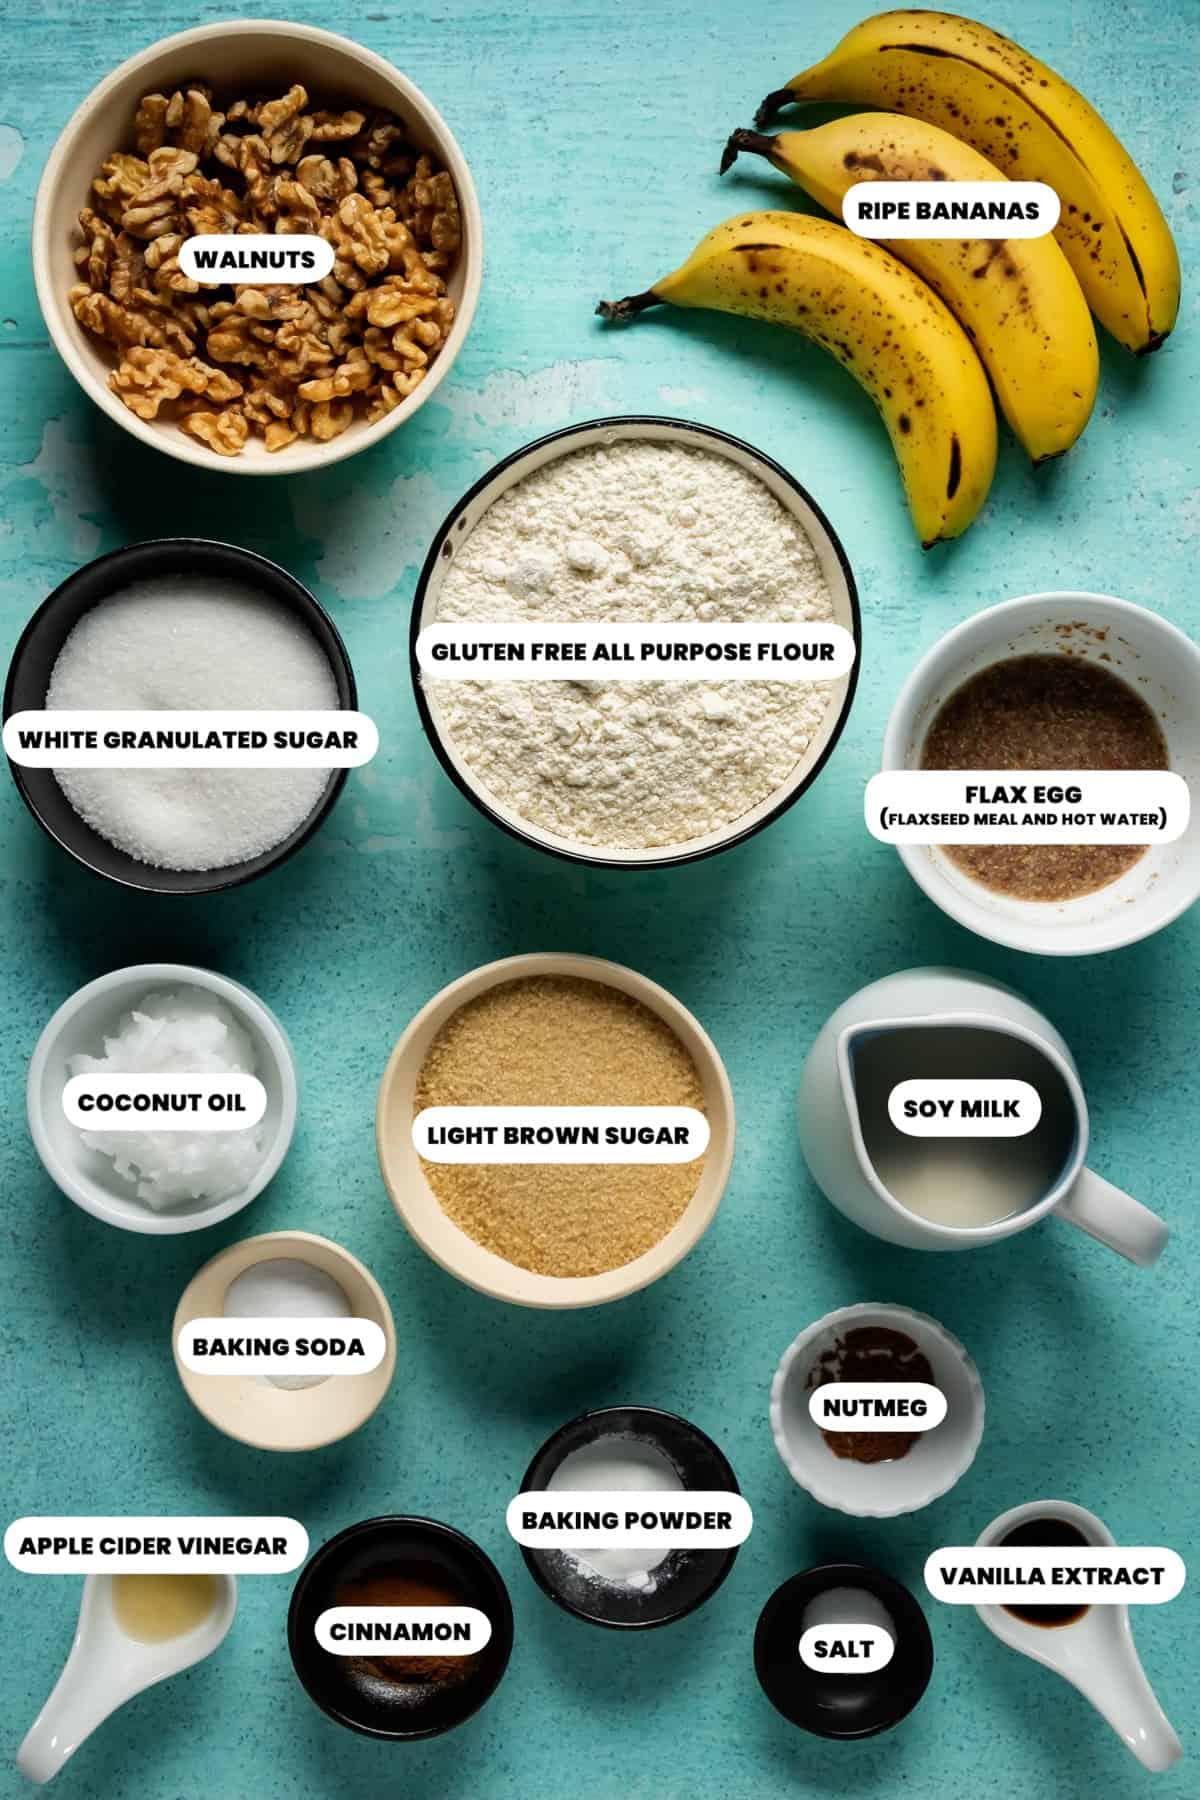 Photo of the ingredients needed to make vegan gluten free banana bread.